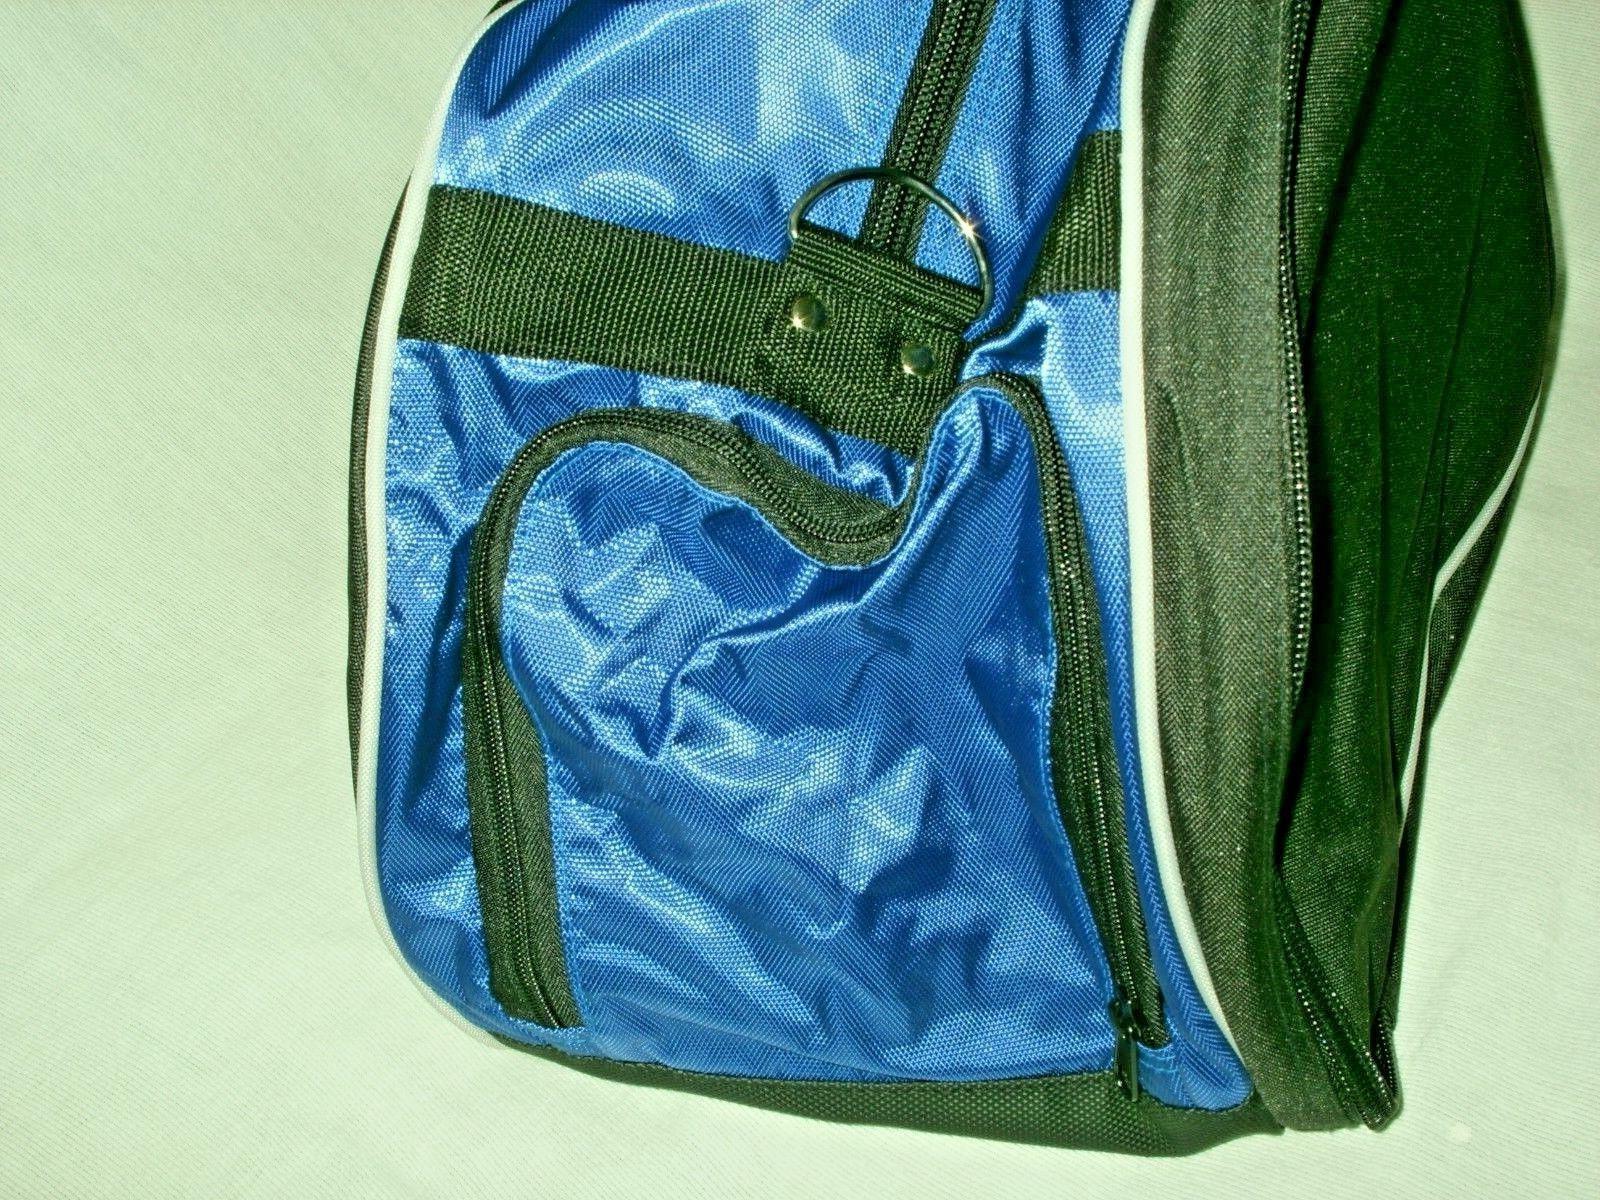 Lacrosse Equipment Bag Riddle /Royal/Black